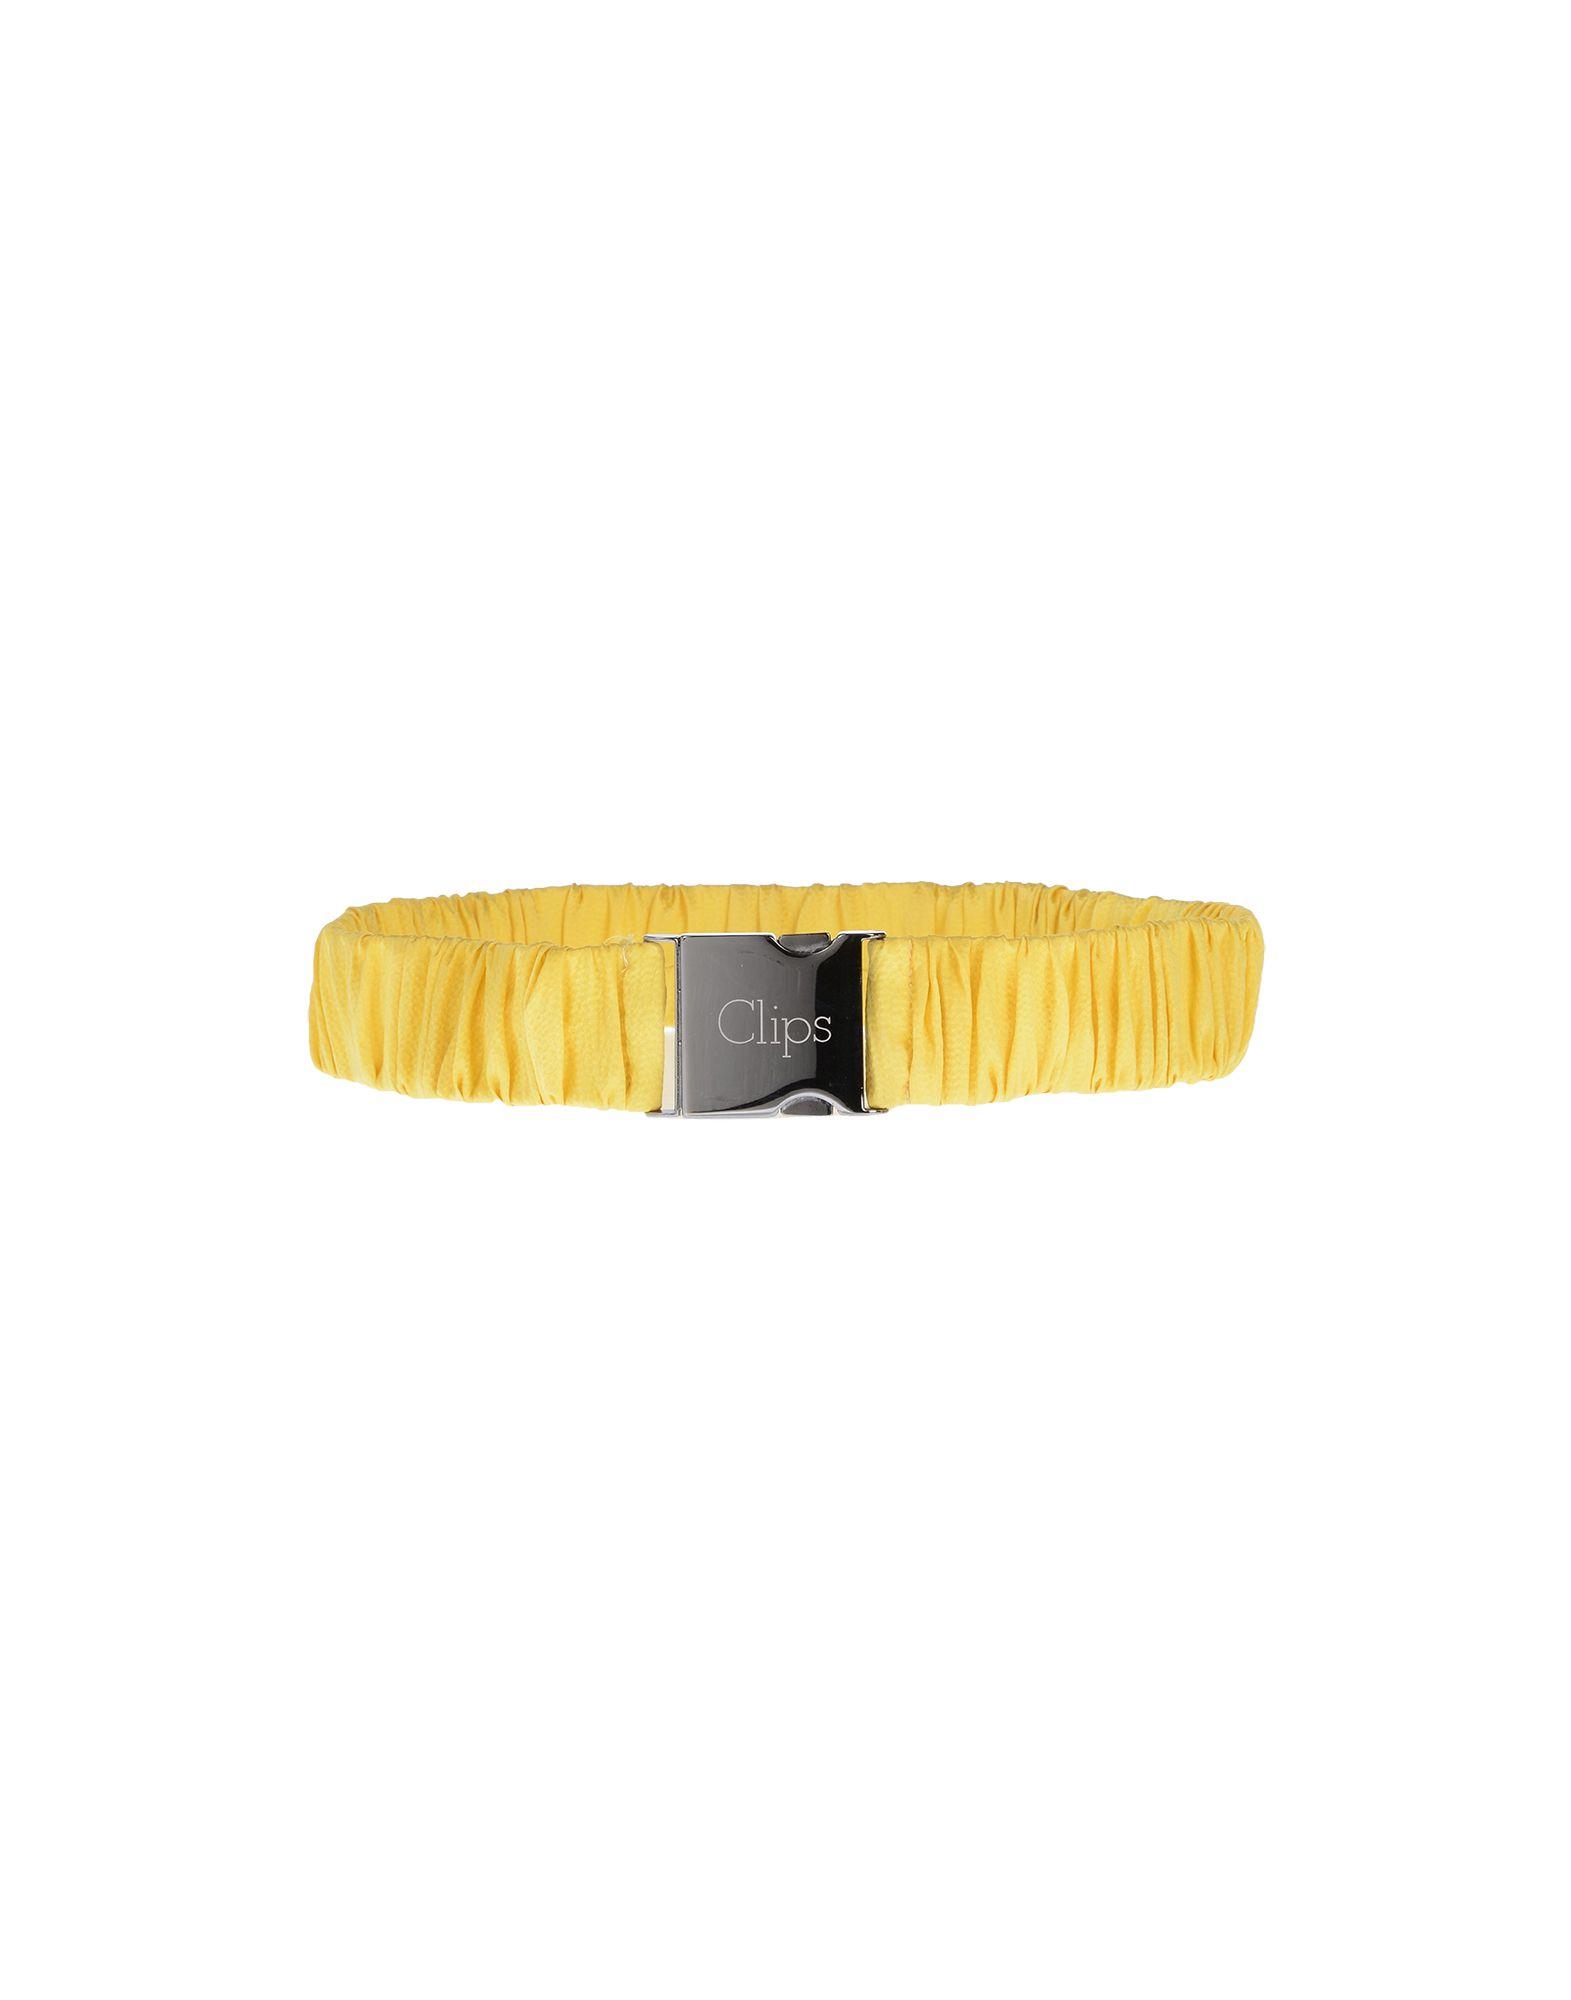 CLIPS Ремень paper clips 50pcs